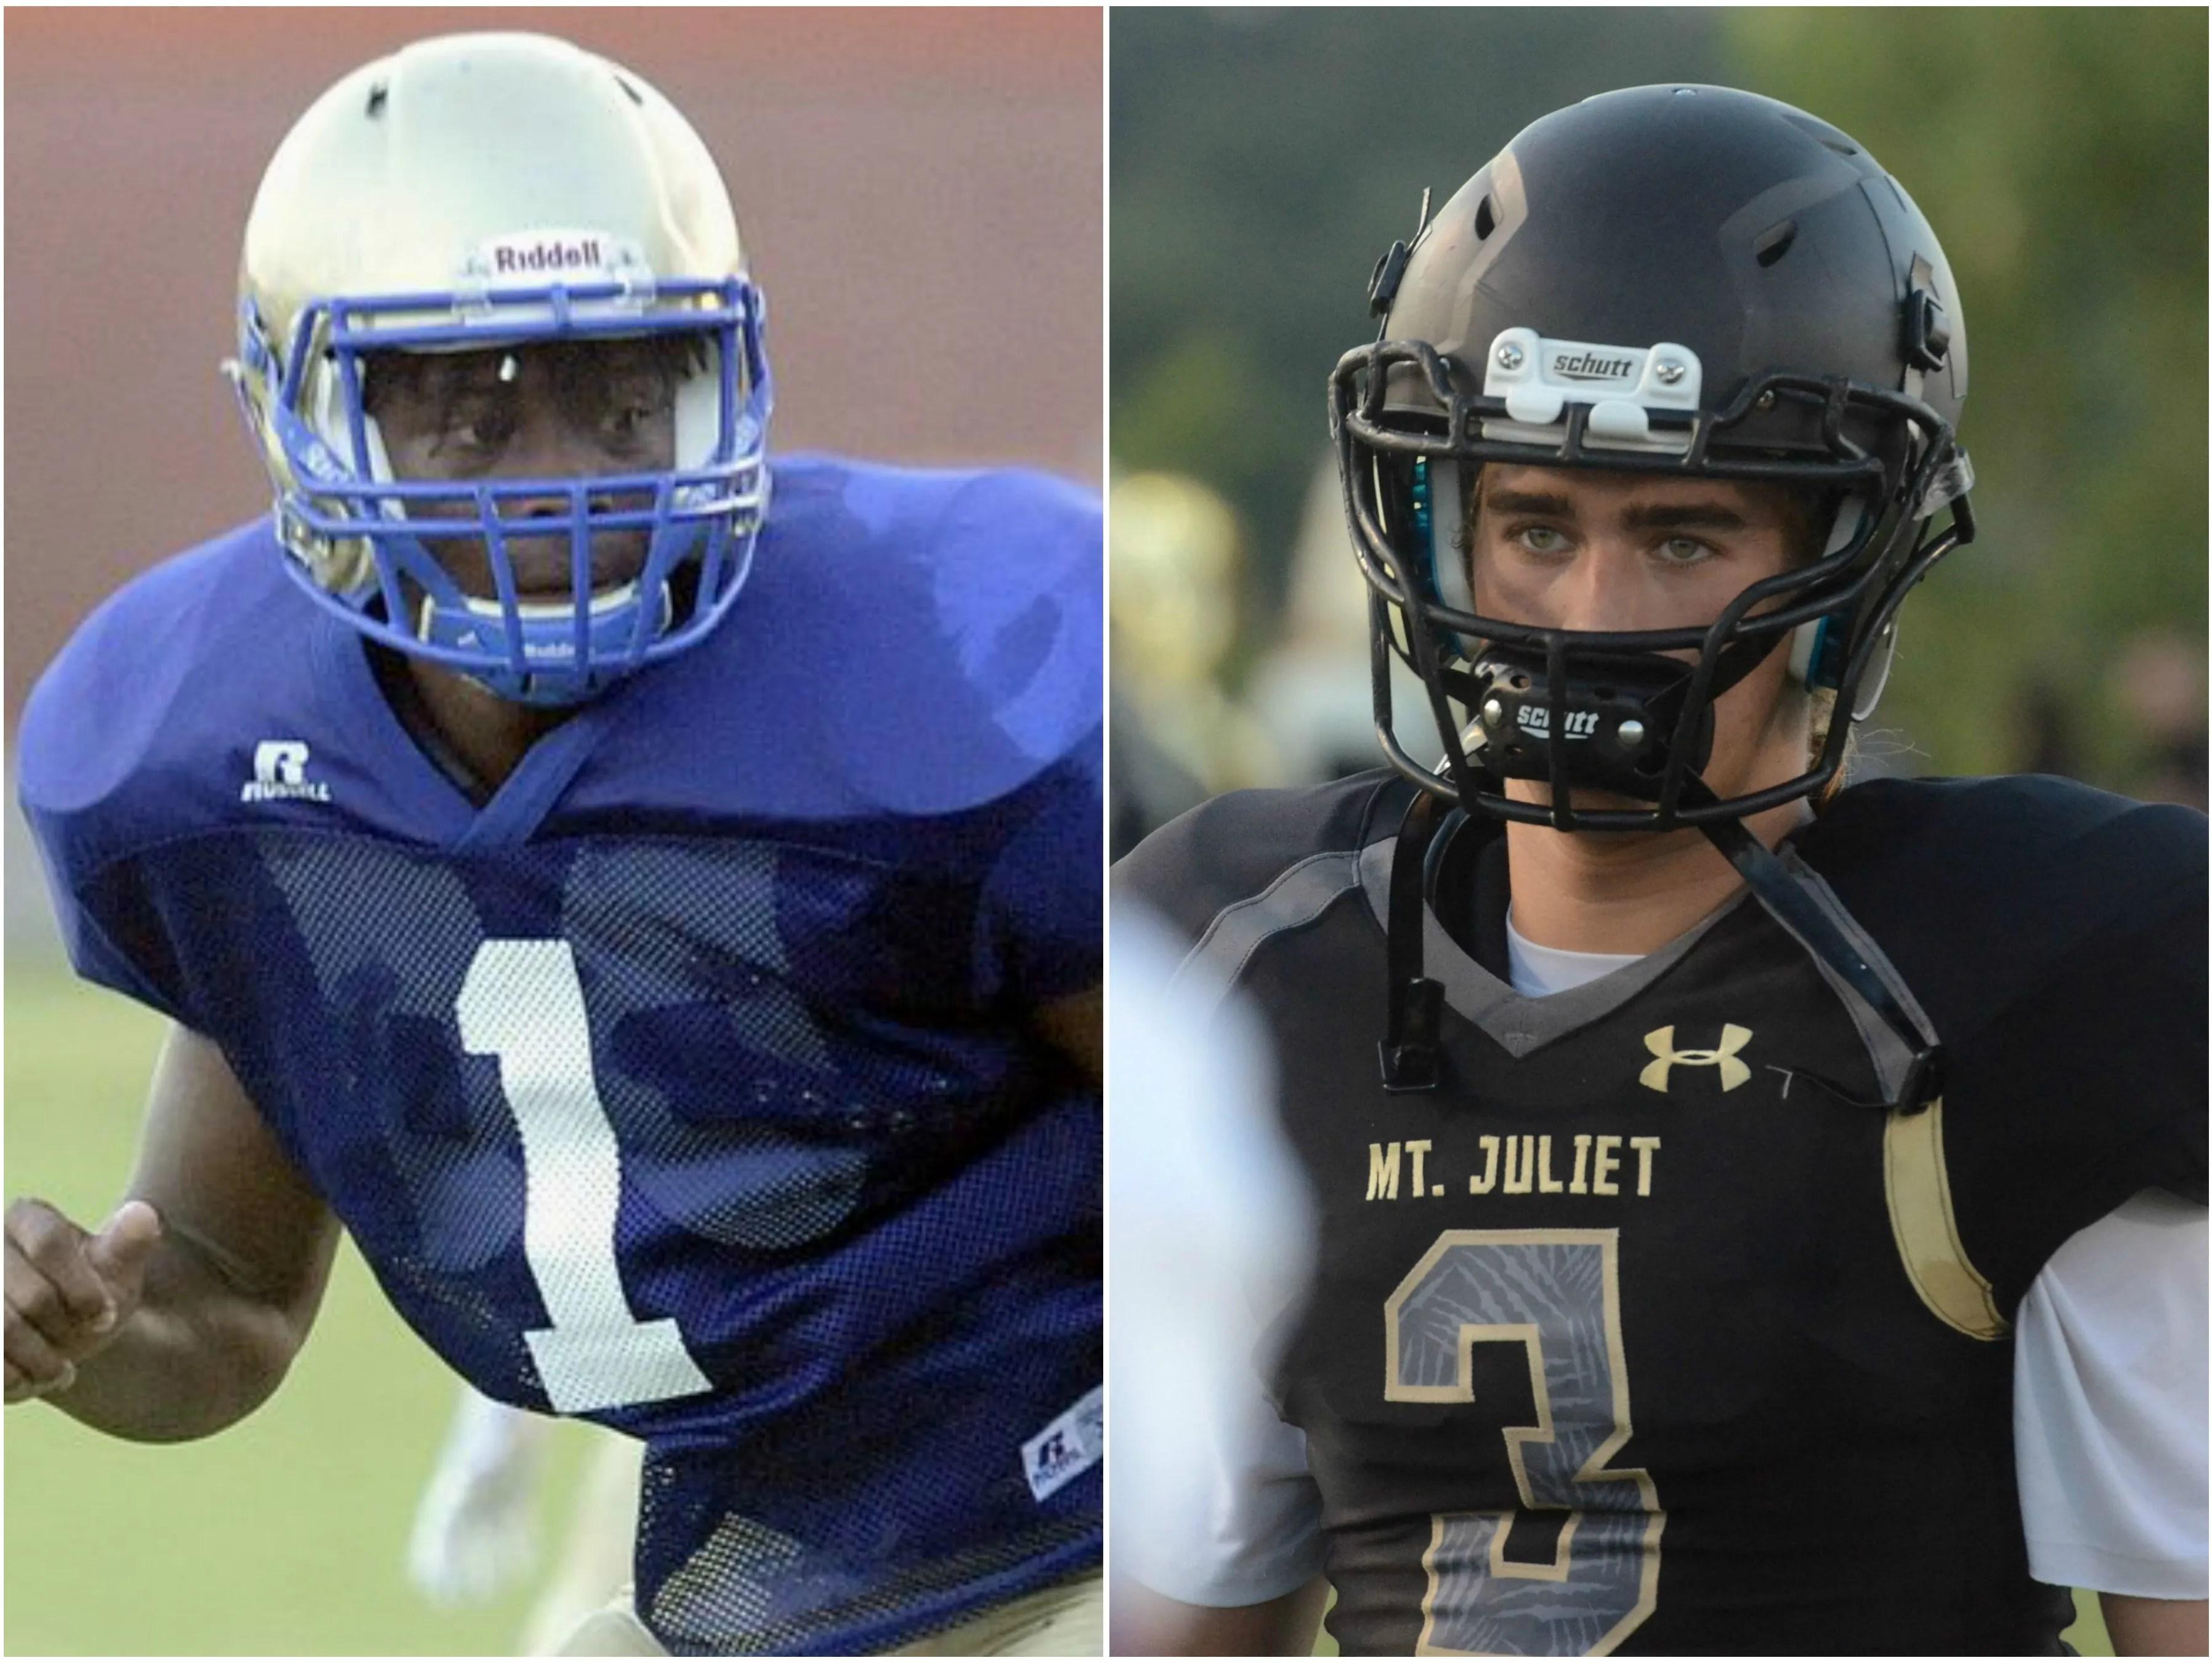 Wilson Central linebacker T.J. Minnifee (left) and Mt. Juliet quarterback Mason Earls (right).